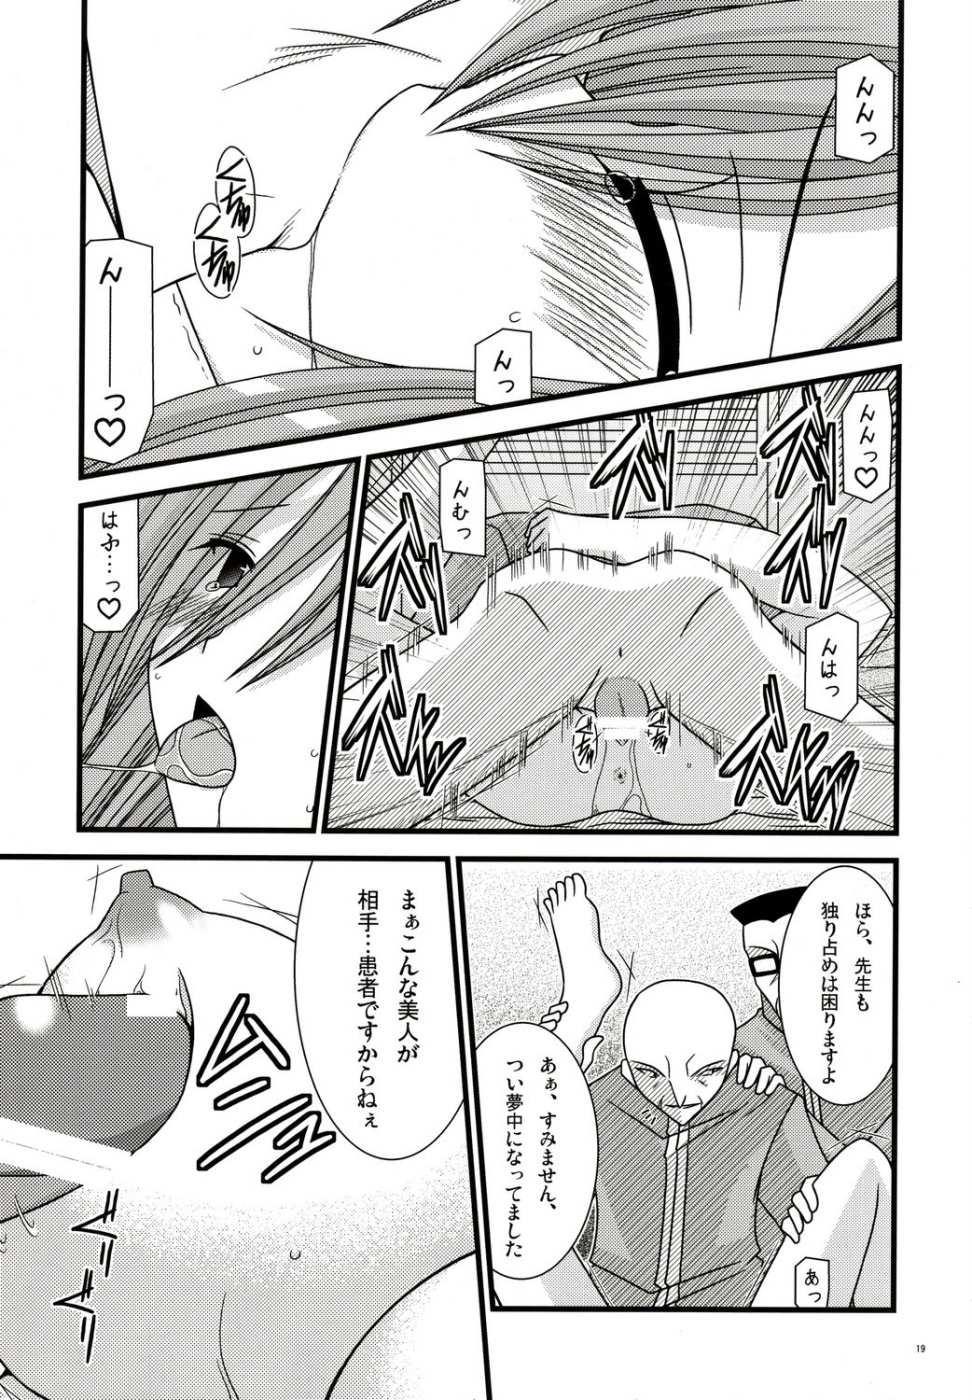 Kanjuku Melon 17